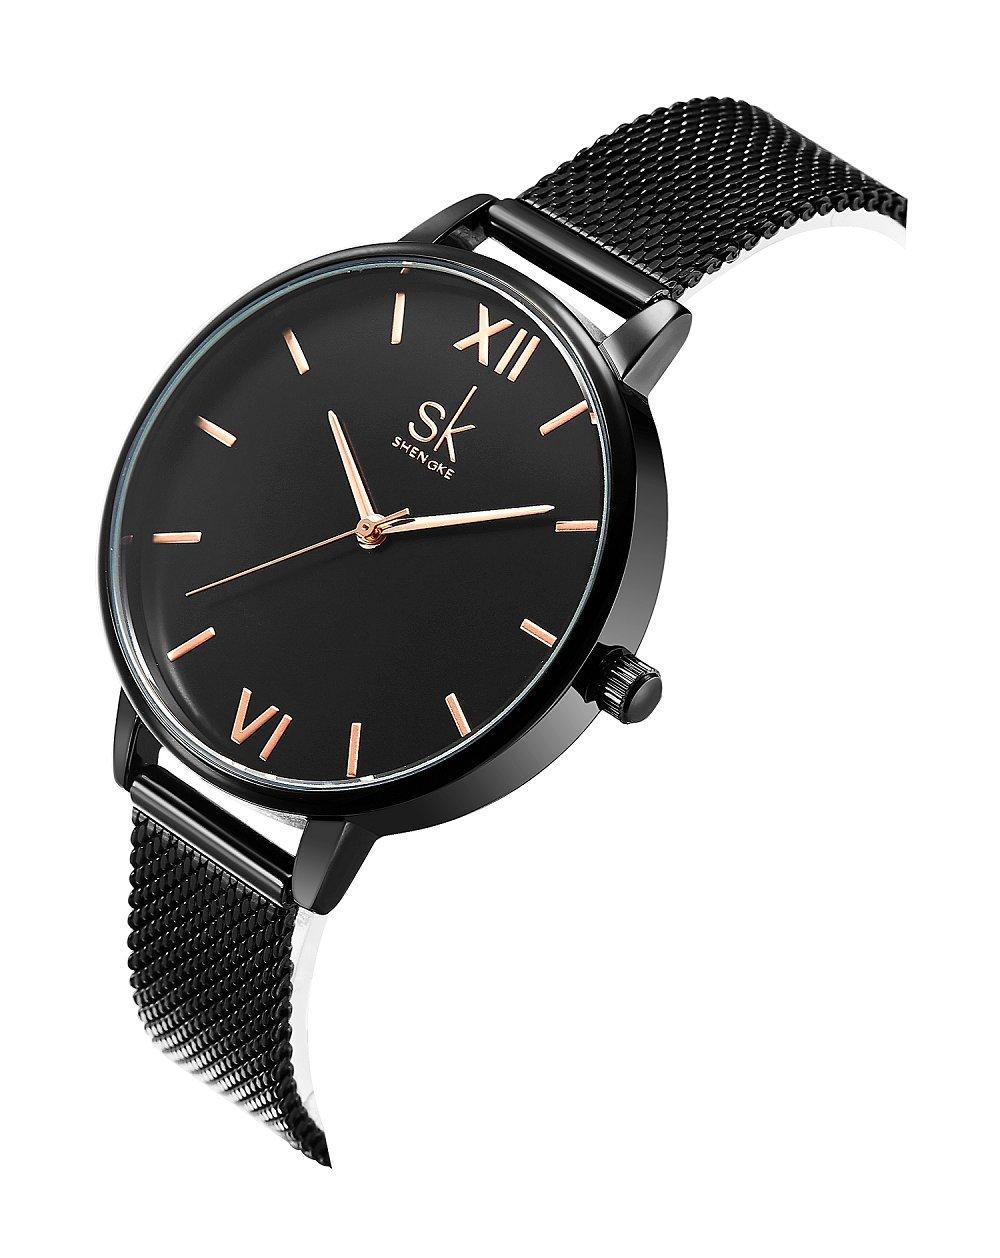 SHENGKE Elegant Simplicity Black Women Watch Mesh Band Women Watches Ladies Business Wristwatch 2018 (Black)